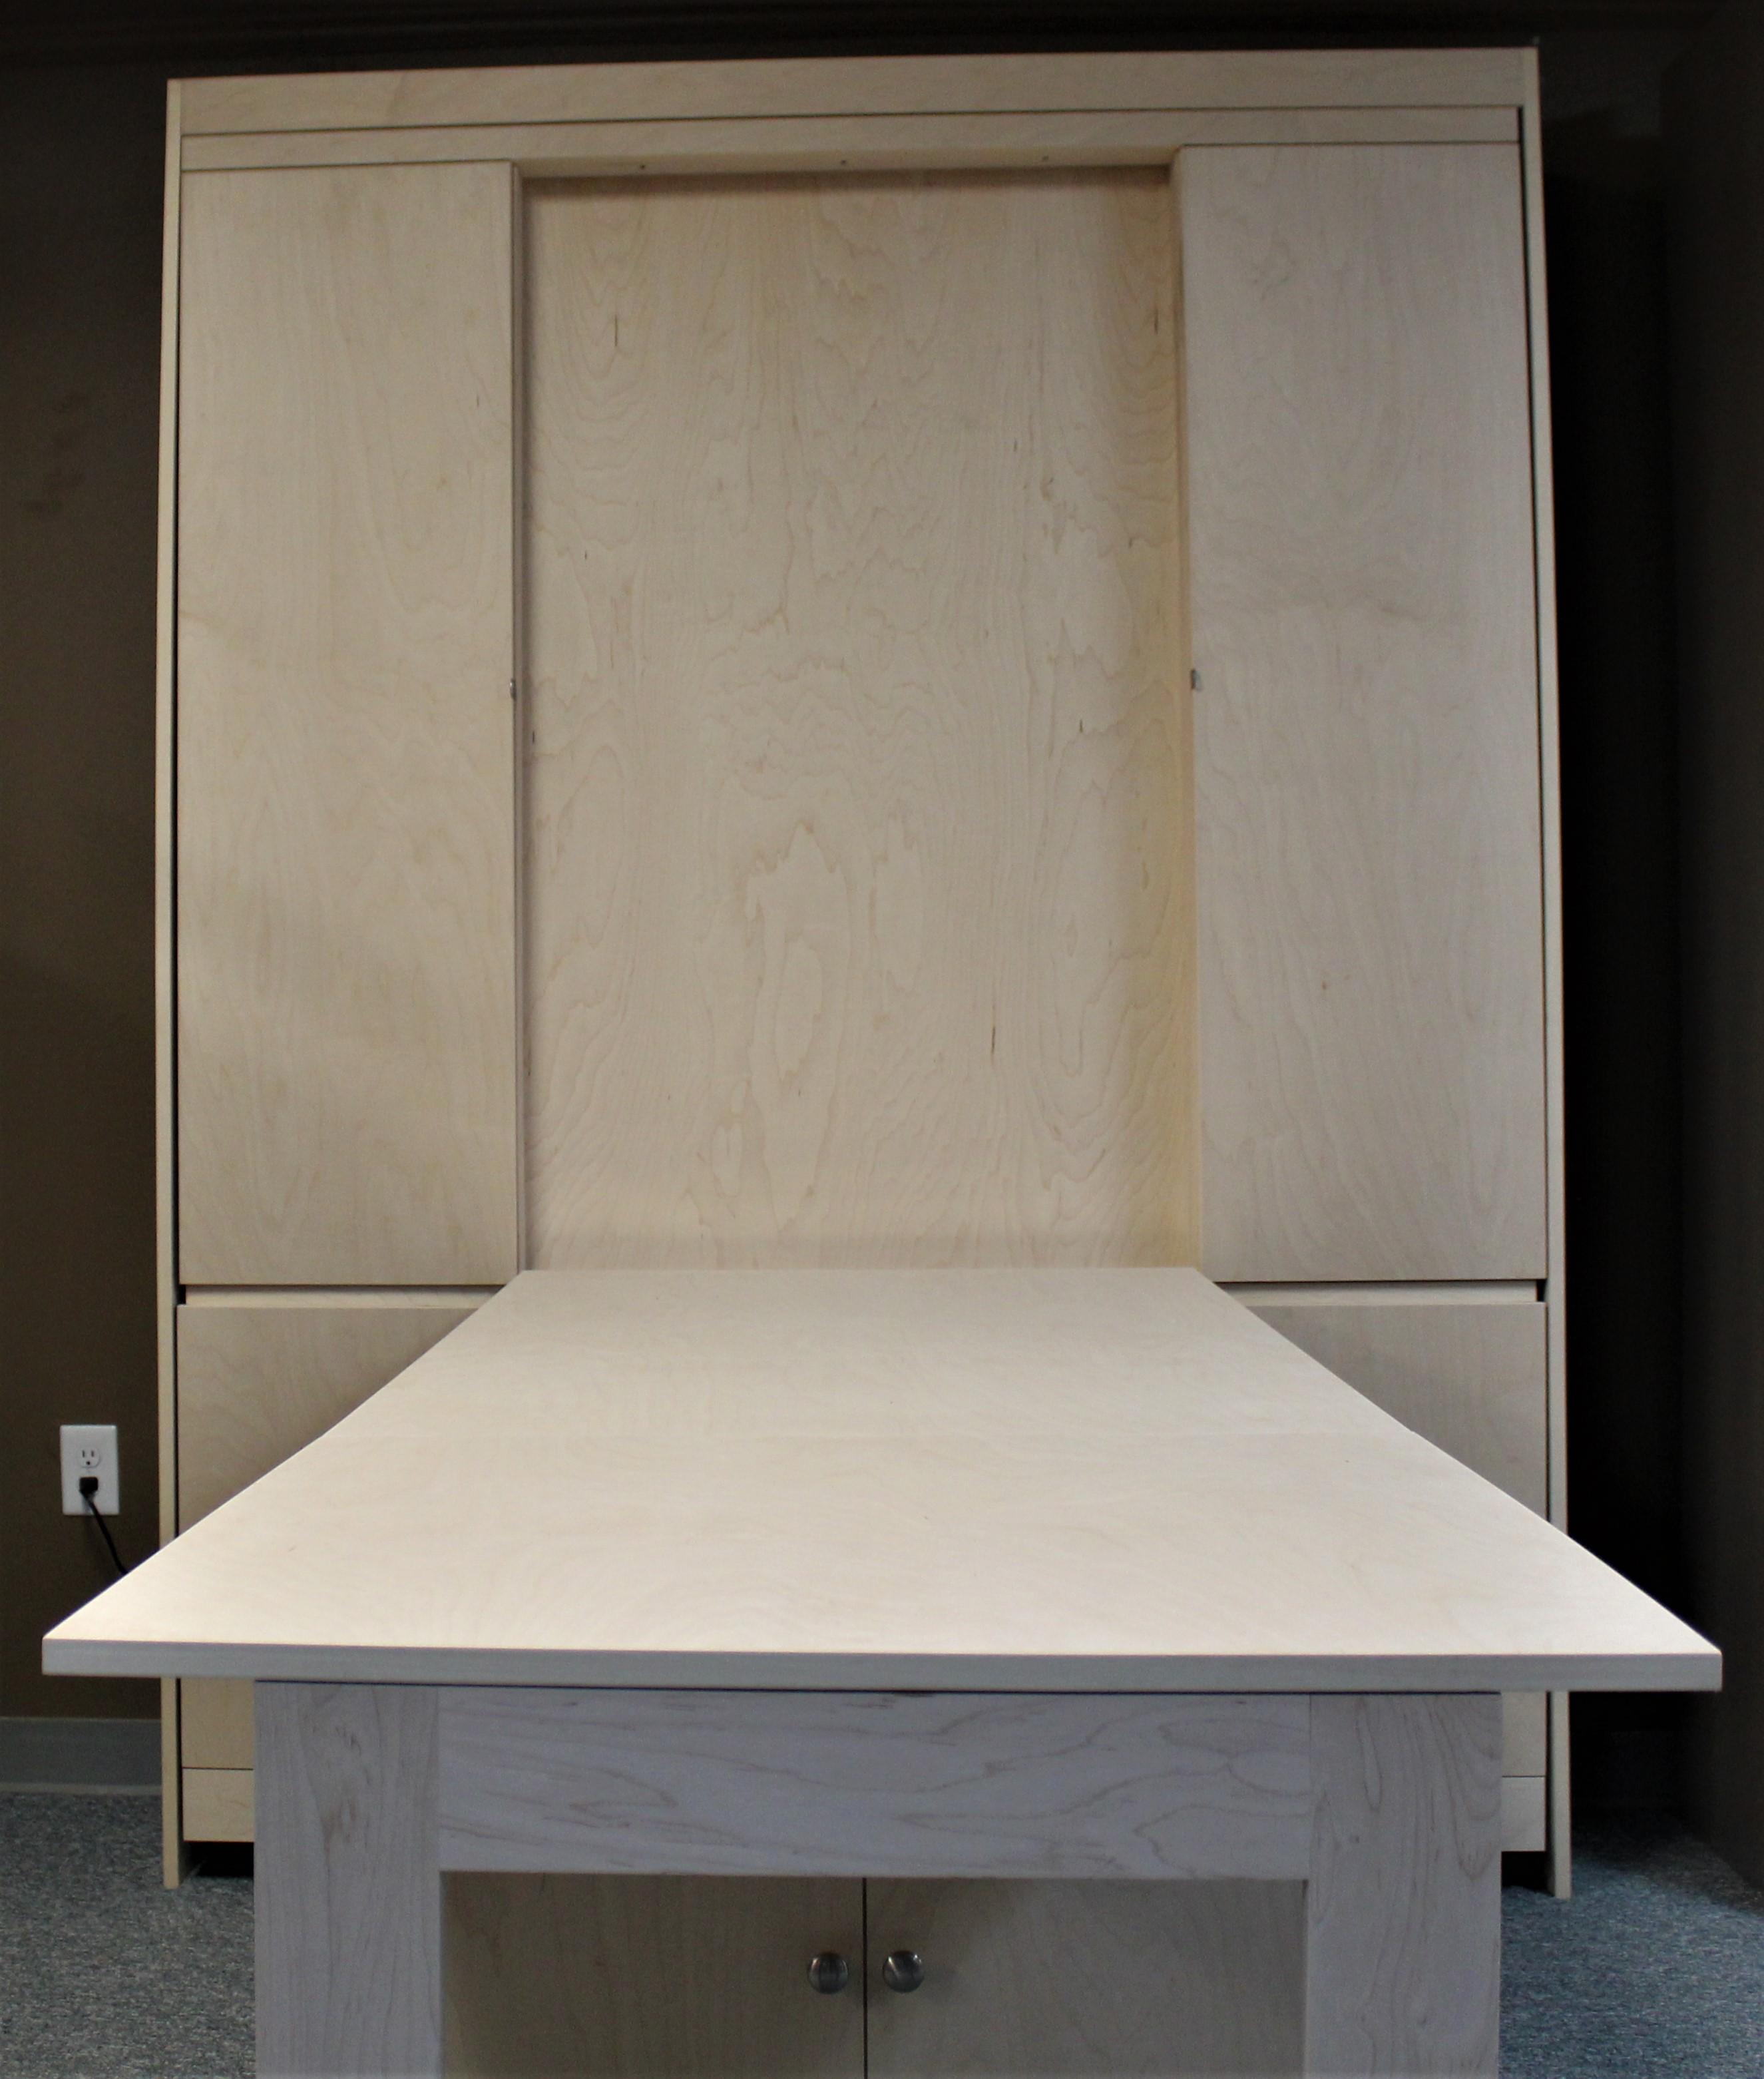 Murphy bed #131-0418 Desk Front